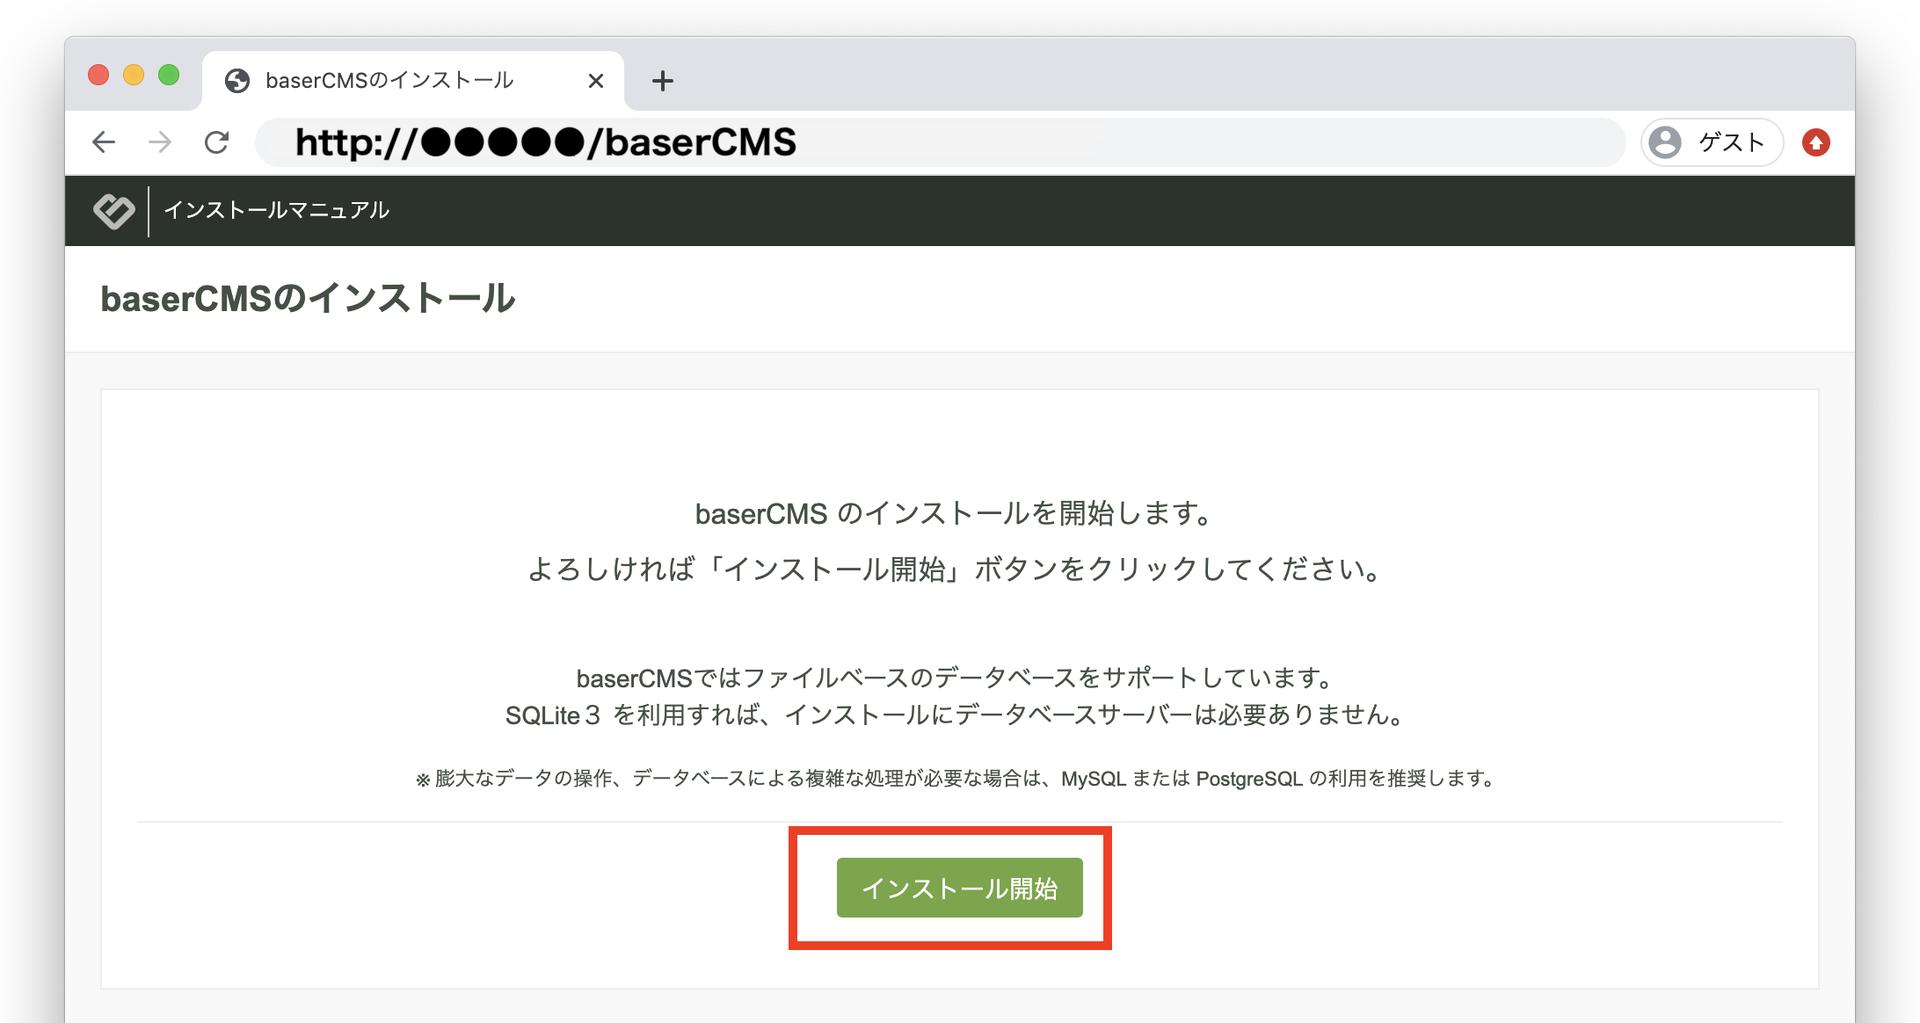 baserCMSのインストール画面